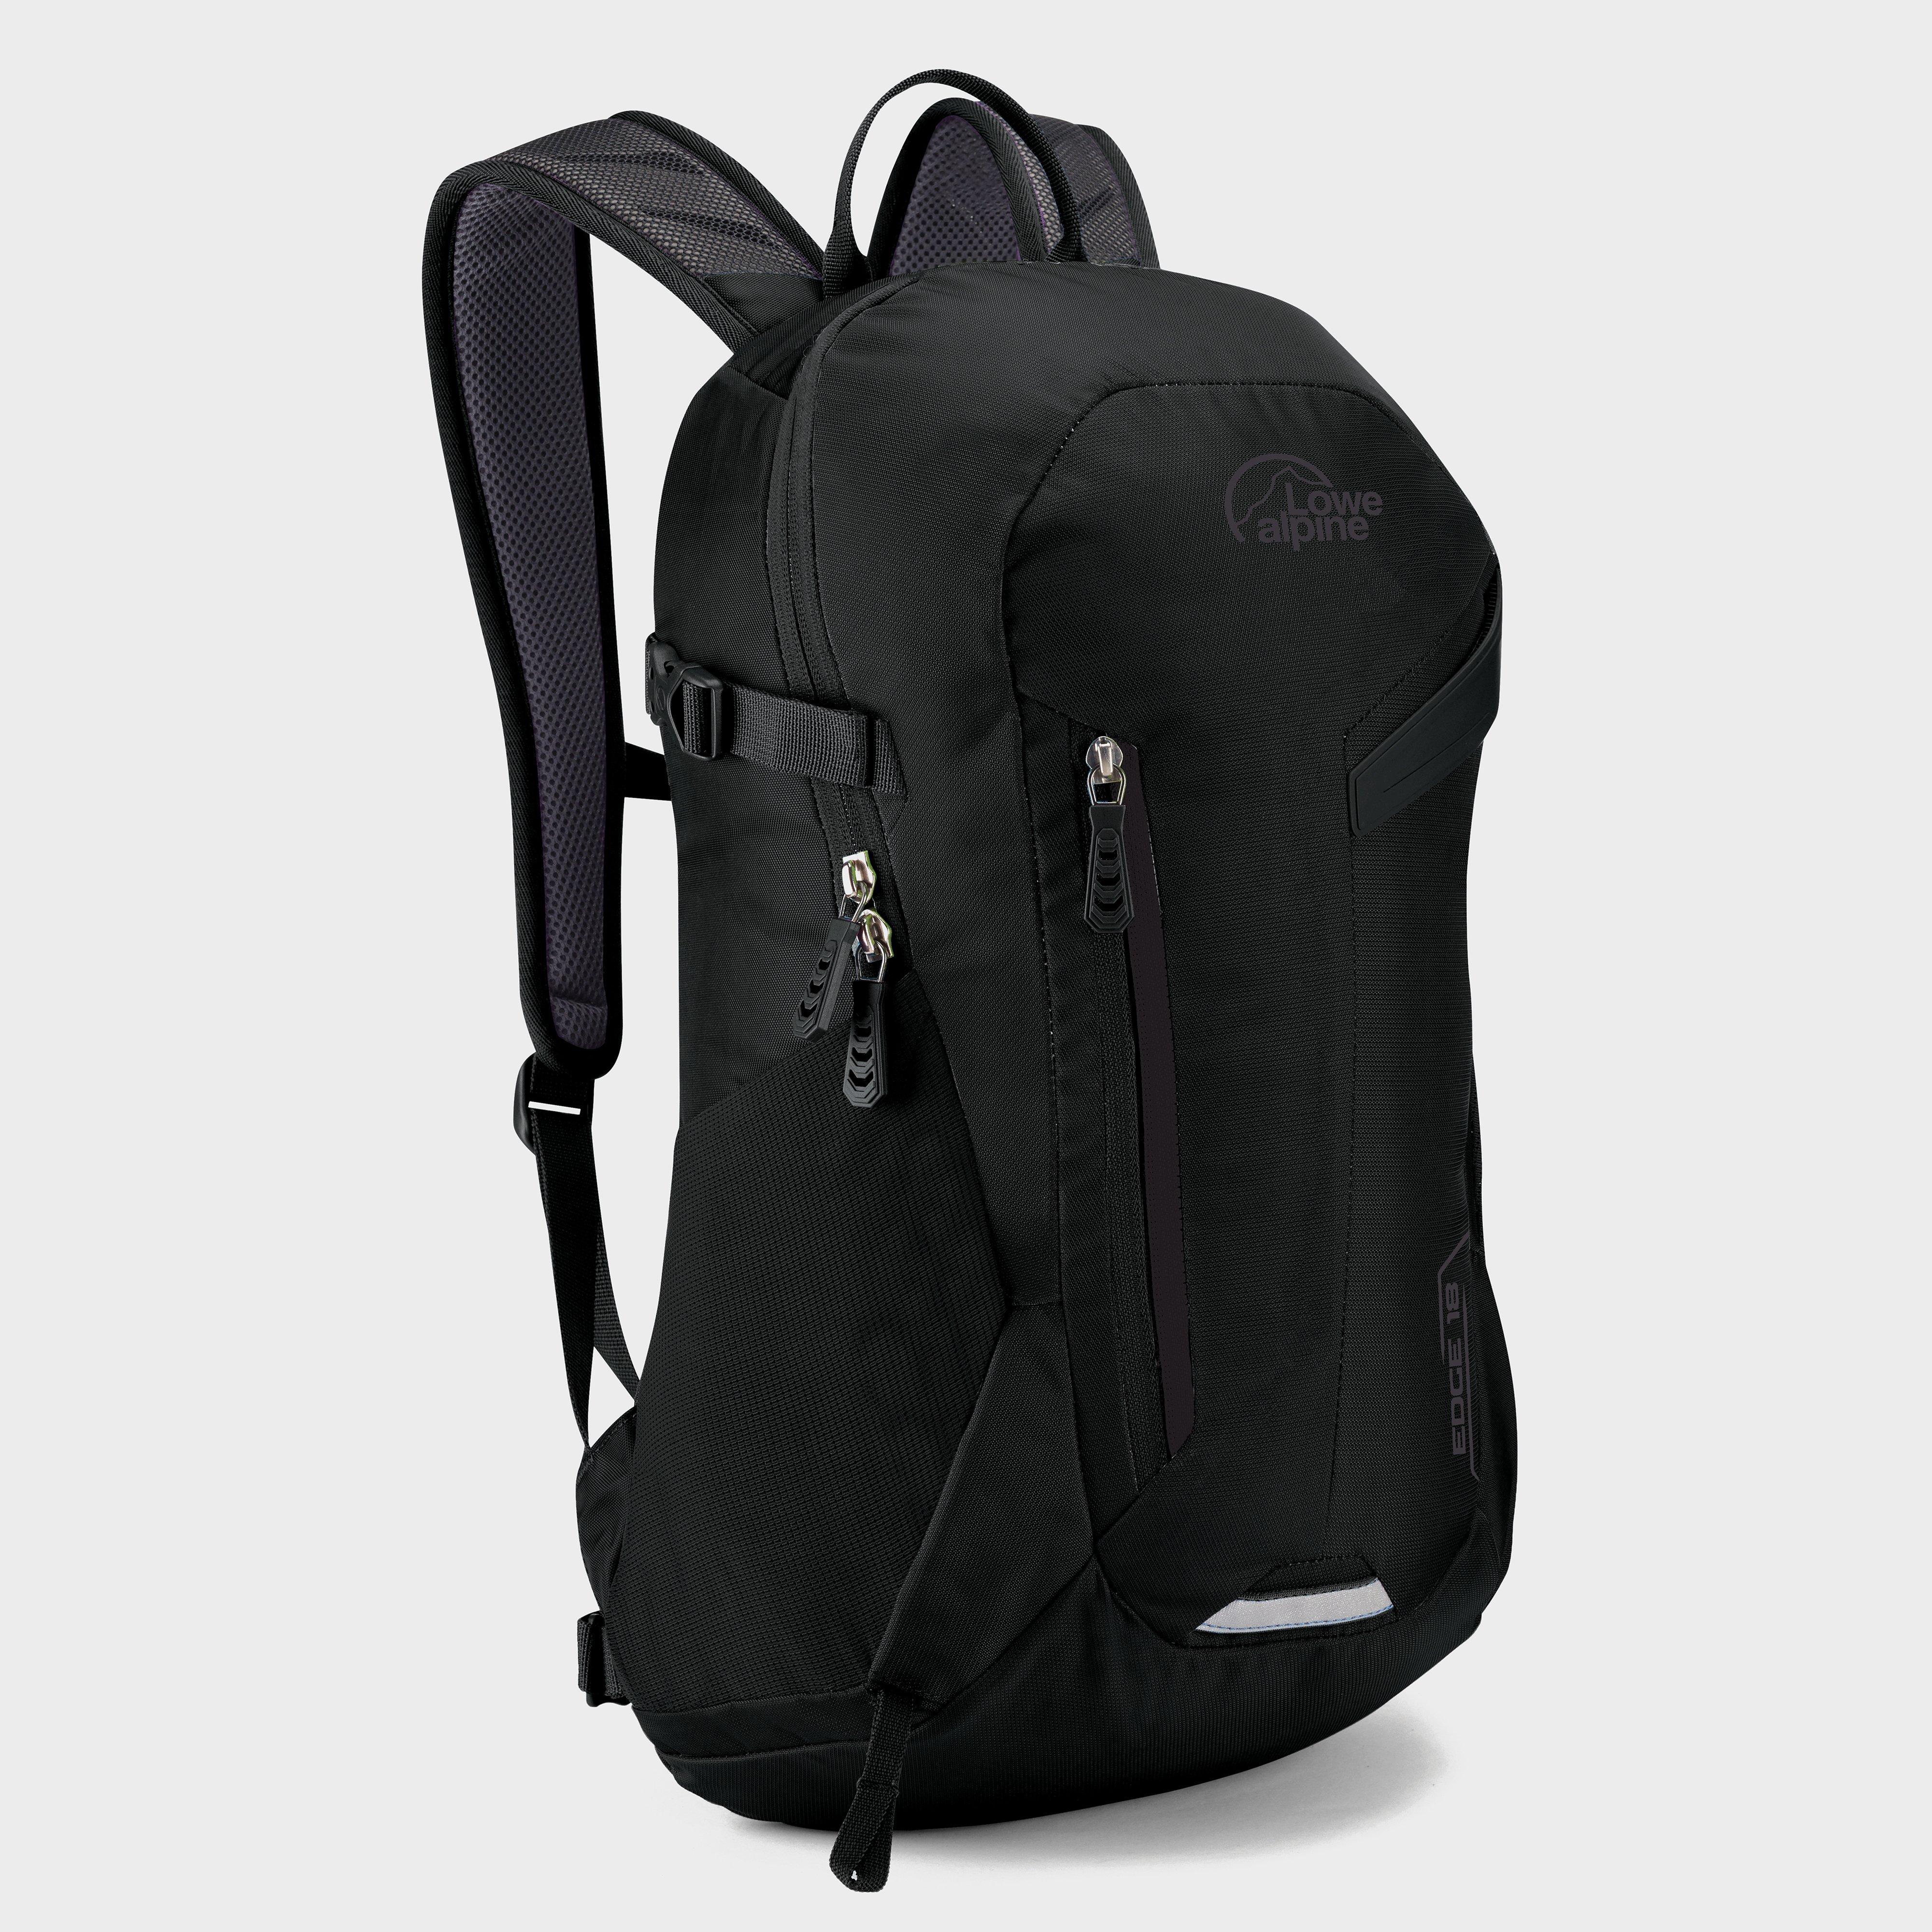 Lowe Alpine Lowe Alpine Edge II 18 Daypack - Black, Black